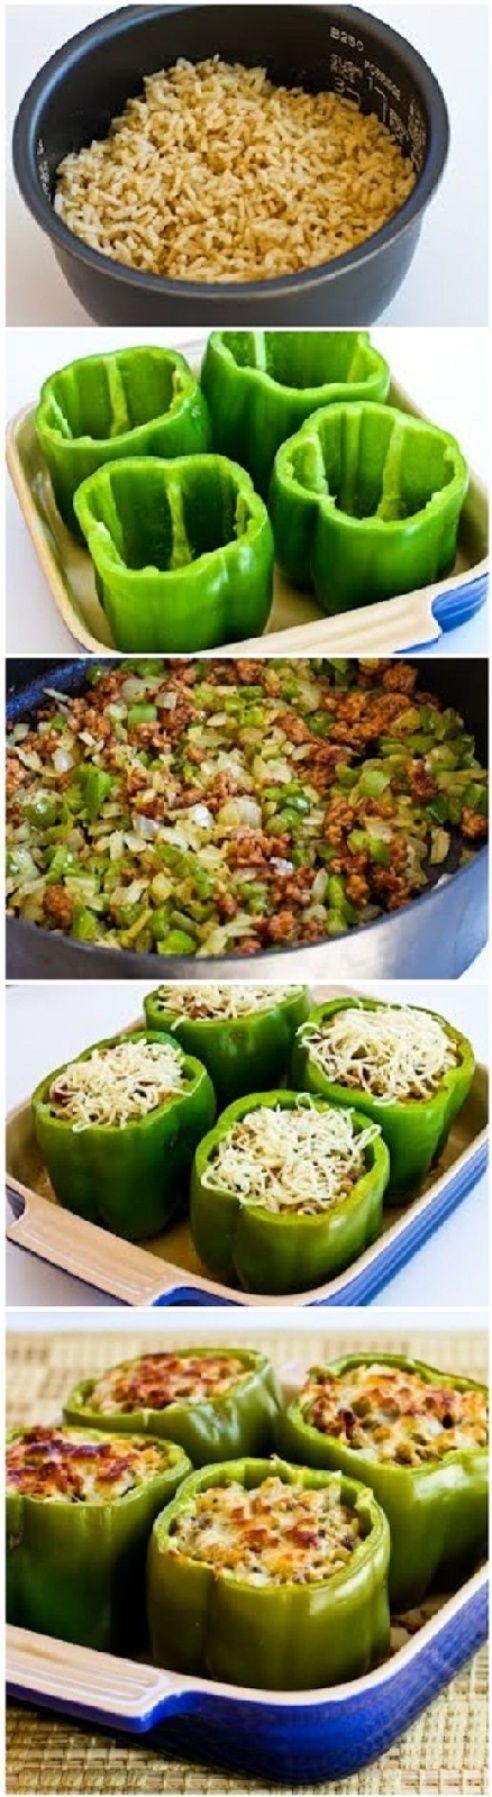 Stuffed Bell Peppers | Healthy Eats